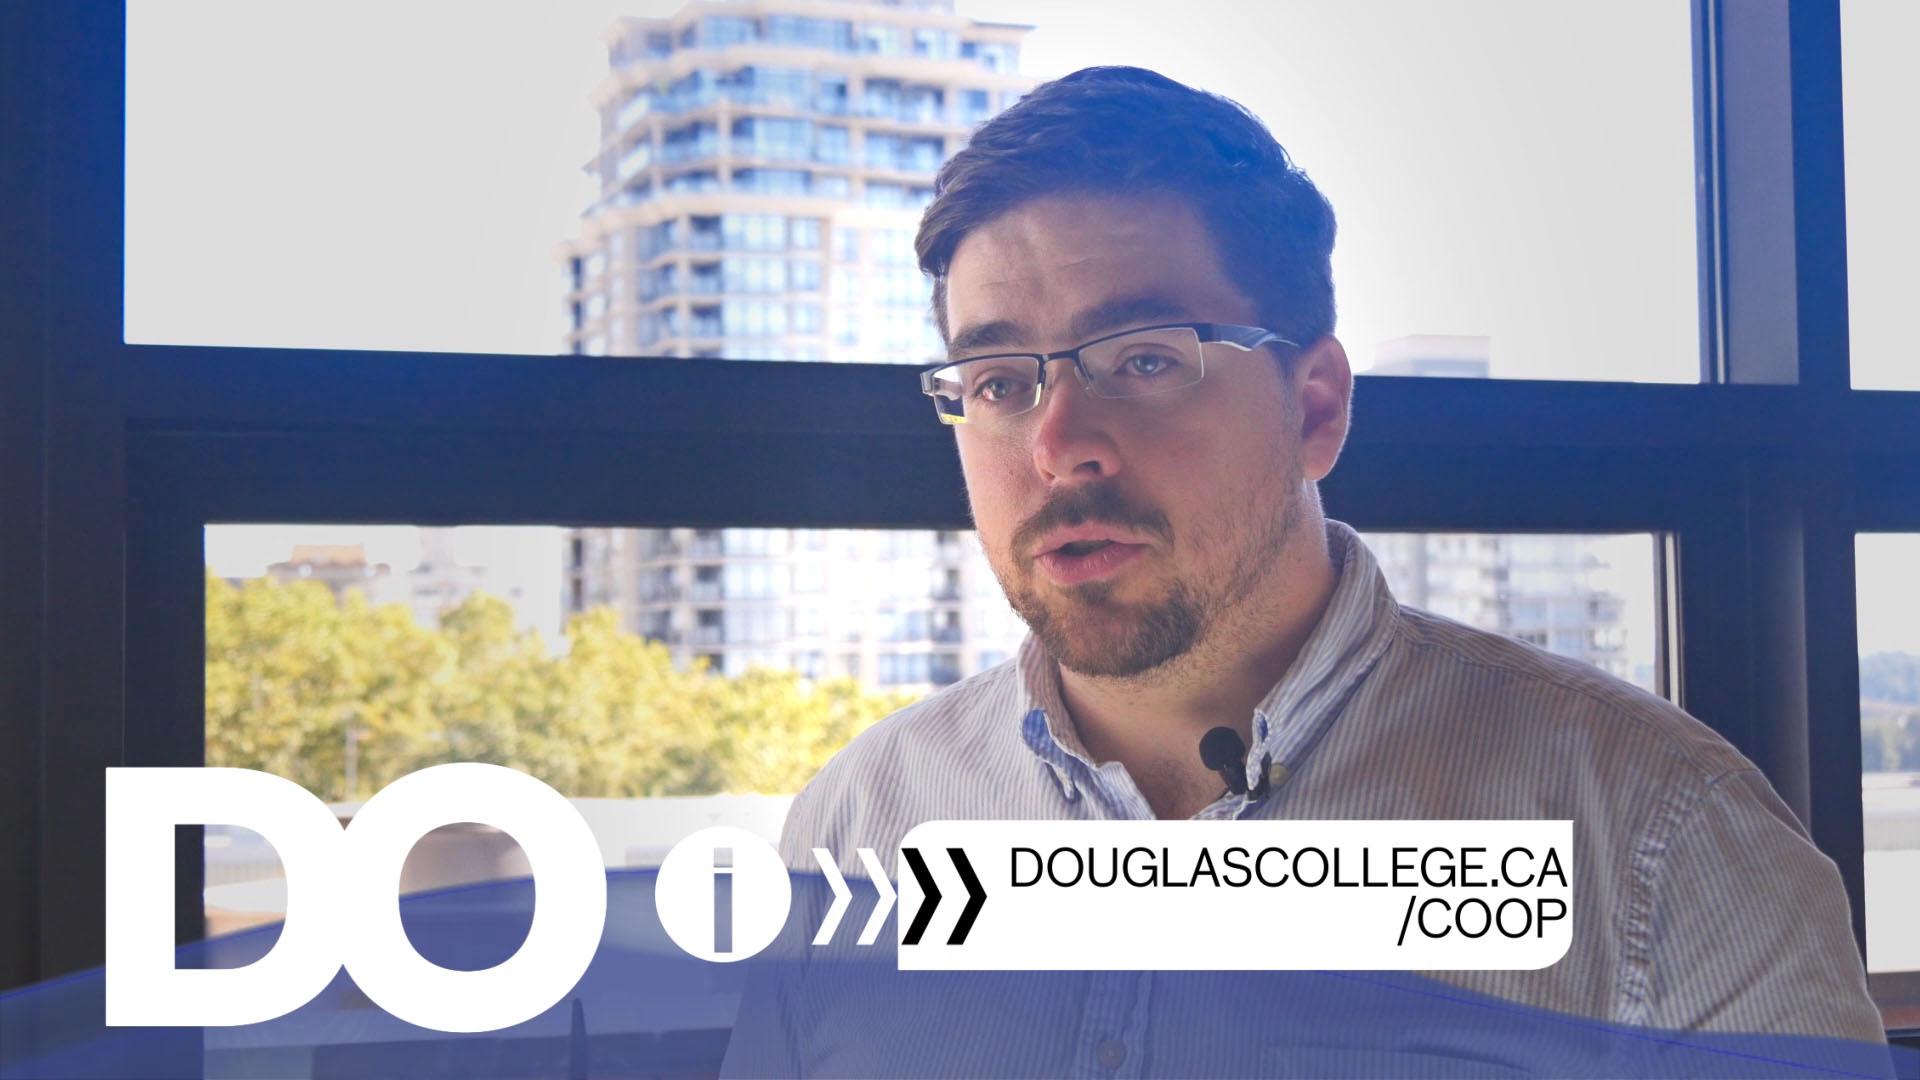 Douglas College Student Promo Iain McHugh